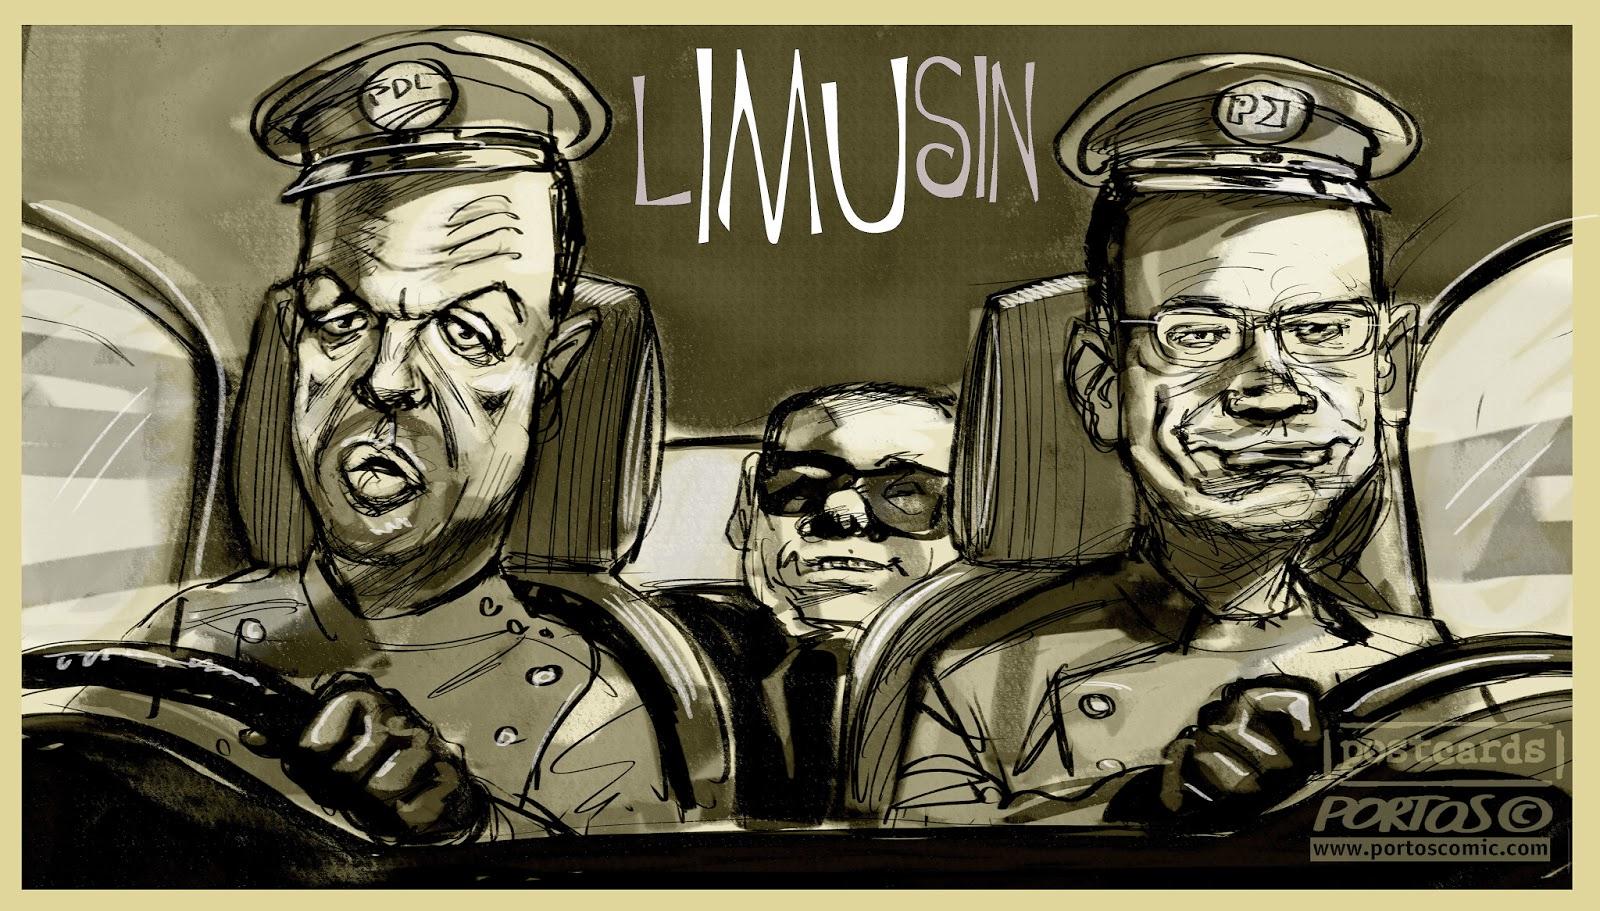 http://2.bp.blogspot.com/-t_LwLXjneCA/UYaLqeauvKI/AAAAAAAAM9U/210oX4JTTYo/s1600/Limusin.jpg